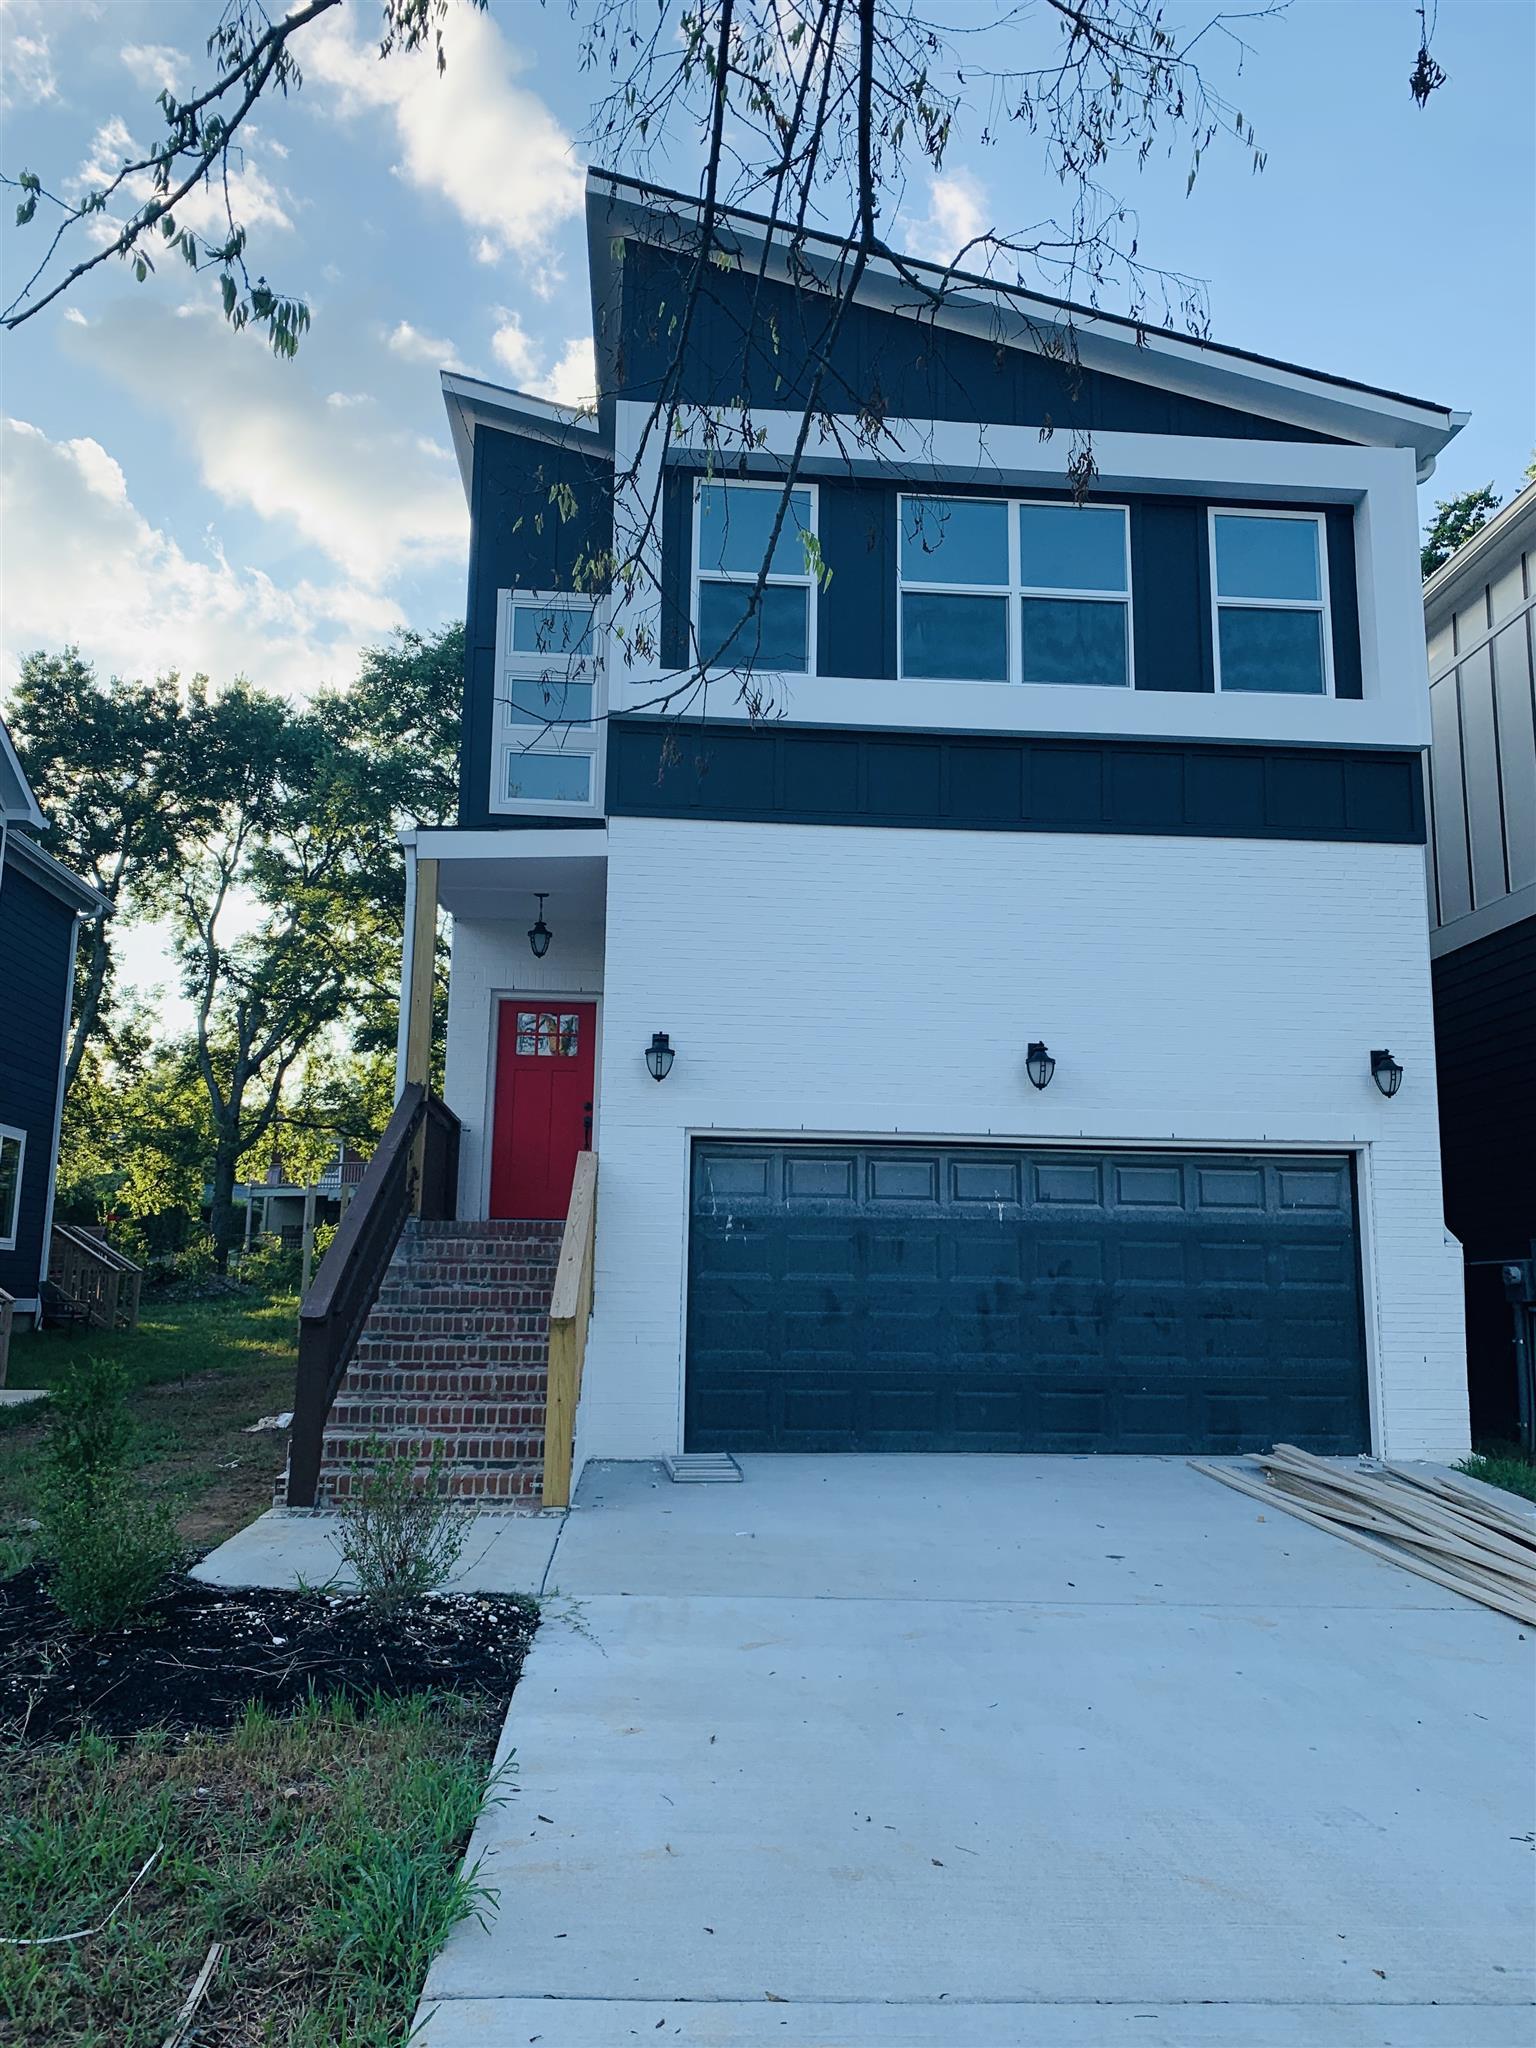 530 Paragon Mills Rd, Nashville, TN 37211 - Nashville, TN real estate listing